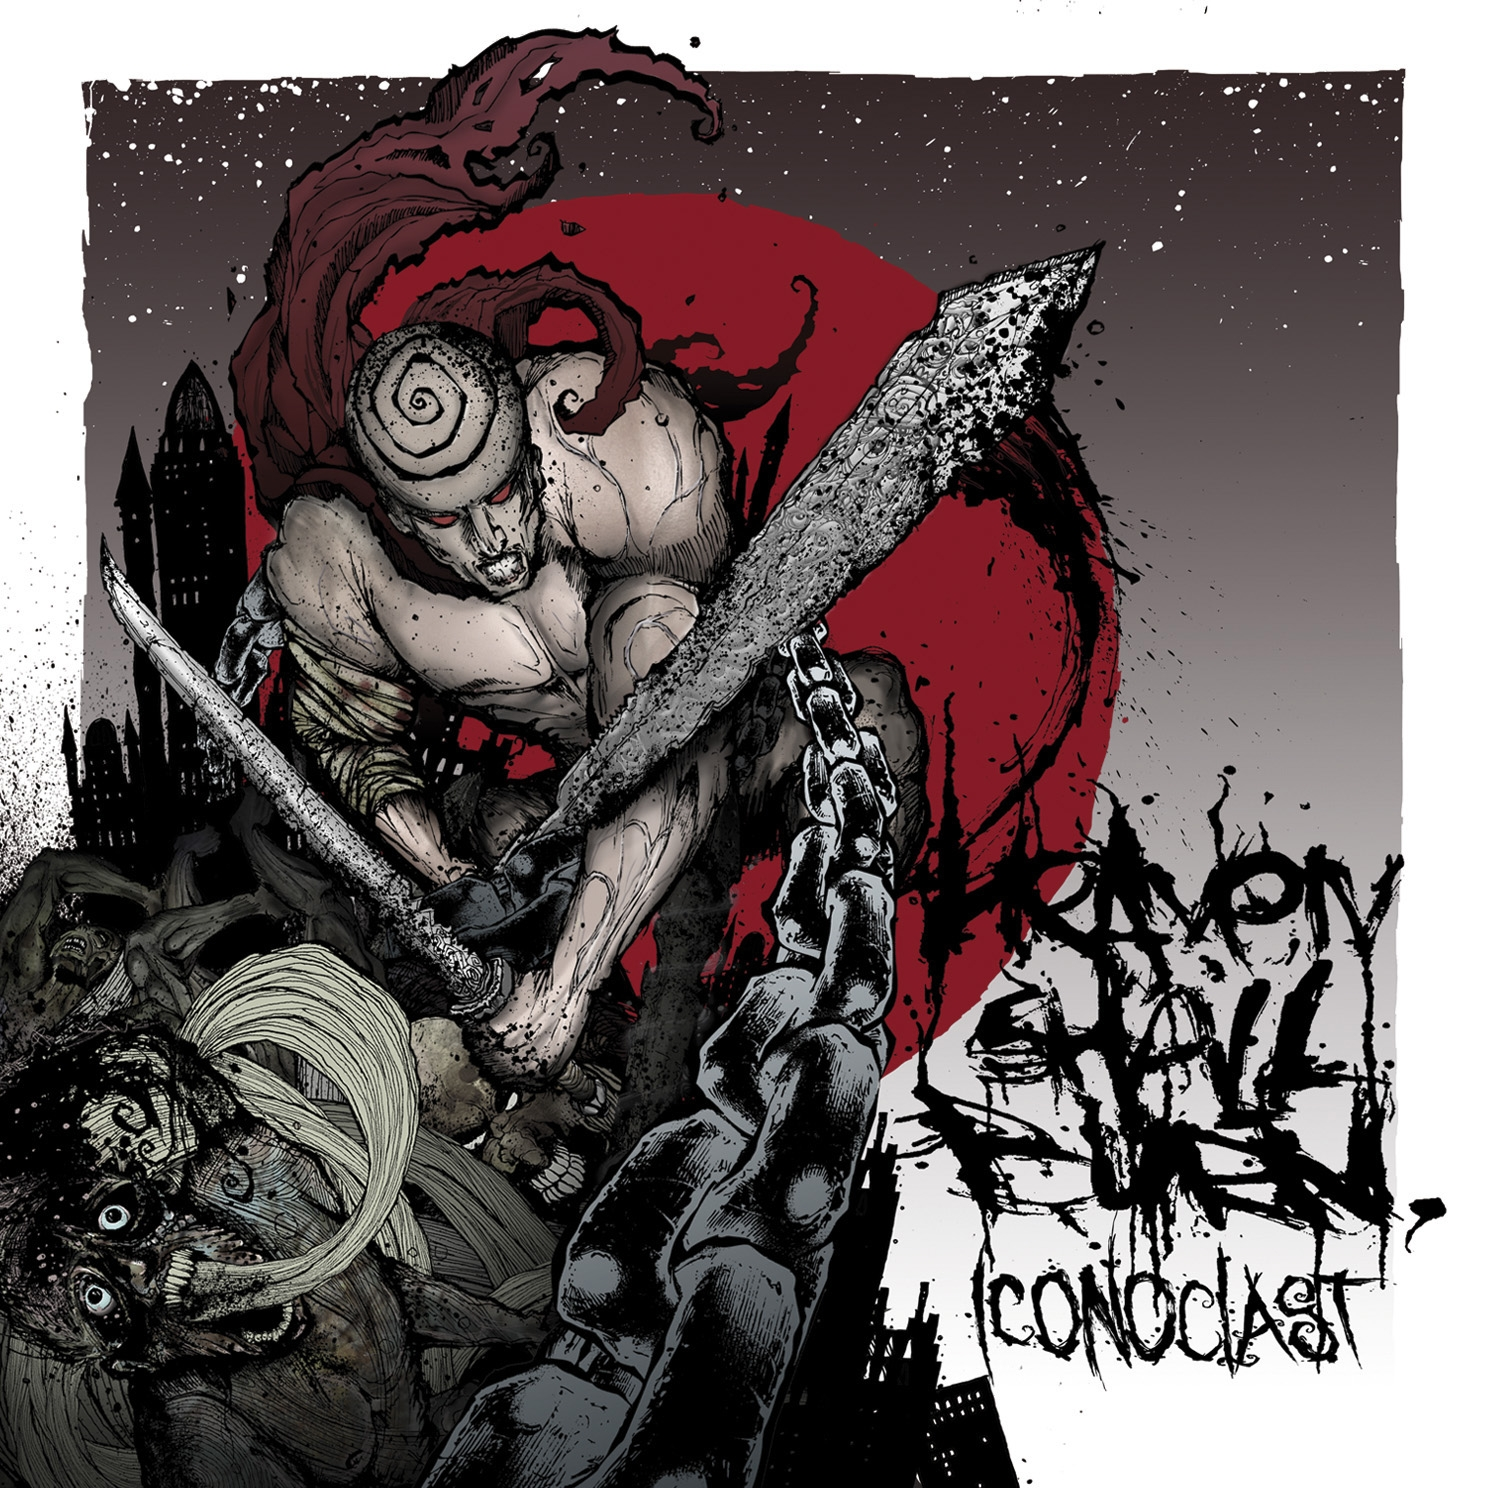 Heaven Shall Burn: Iconoclast (2008) Book Cover